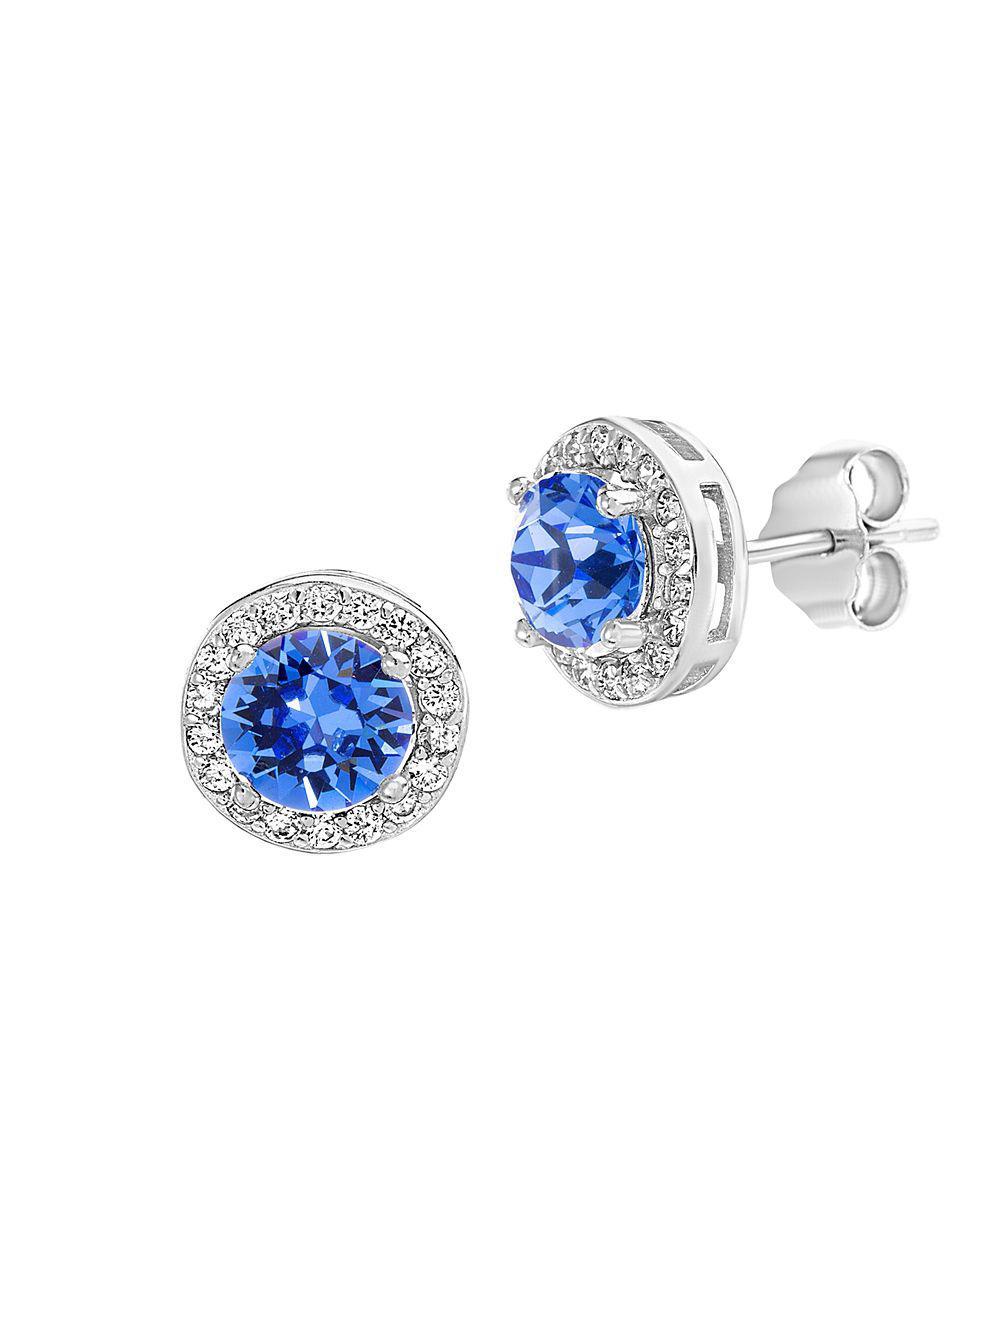 aeb8ada573c09d Lord   Taylor. Women s Blue 925 Sterling Silver   Swarovski Crystal Halo  Stud Earrings